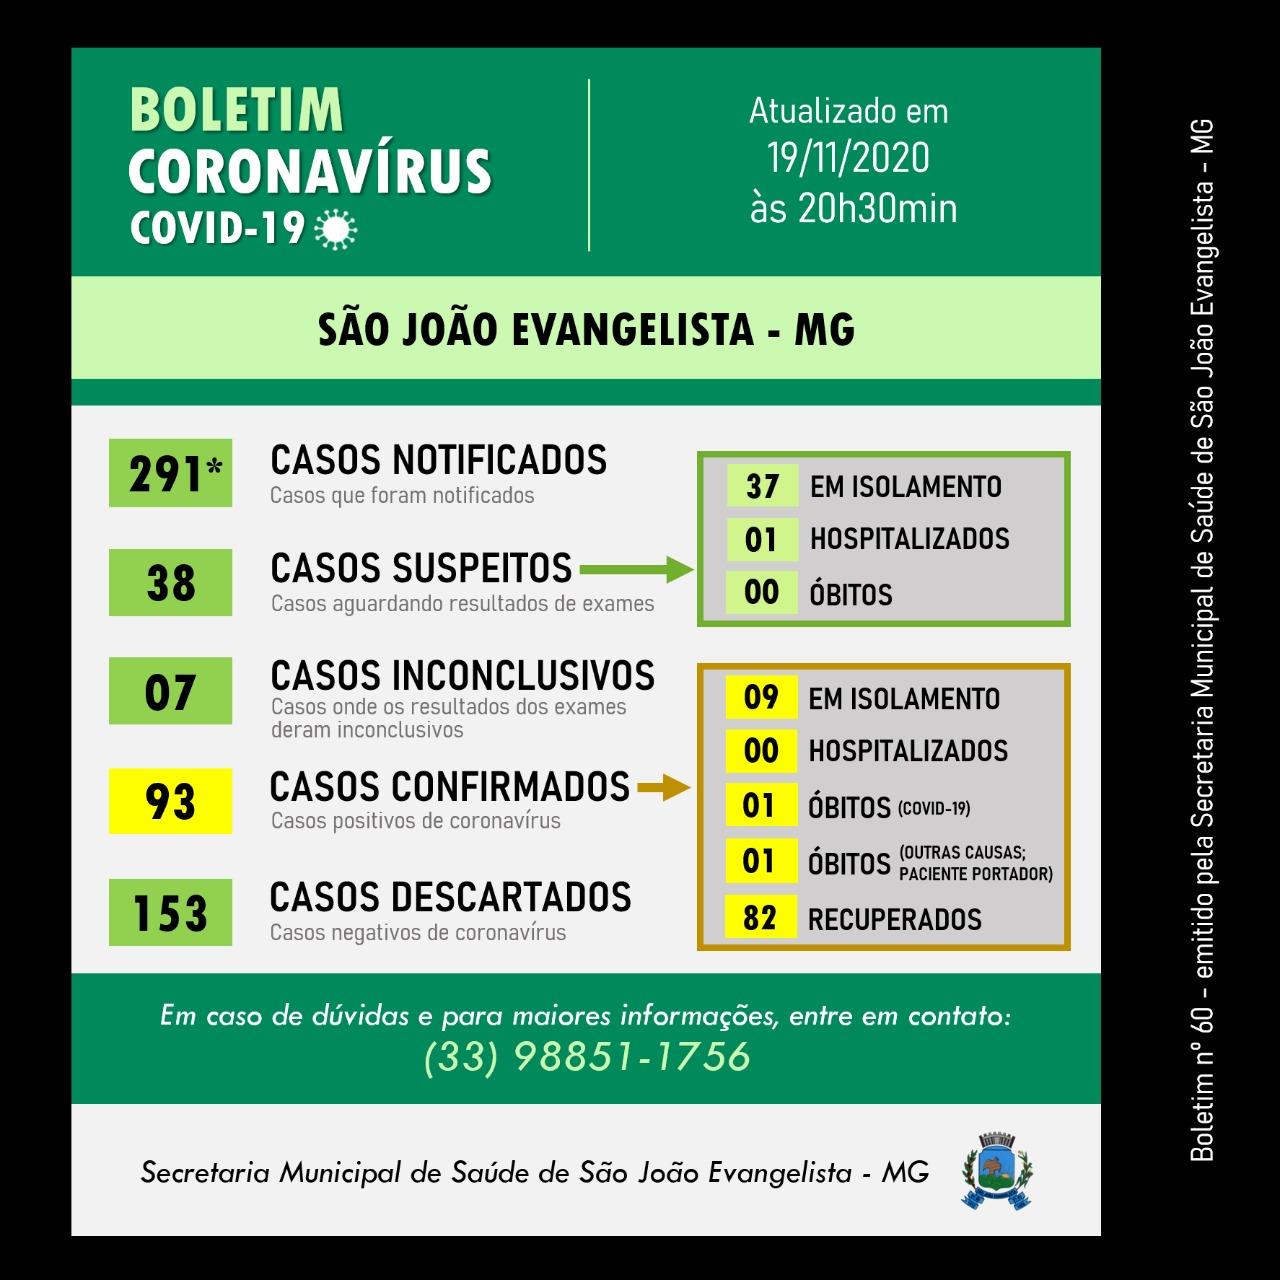 BOLETIM OFICIAL CORONAVÍRUS 19 DE NOVEMBRO DE 2020